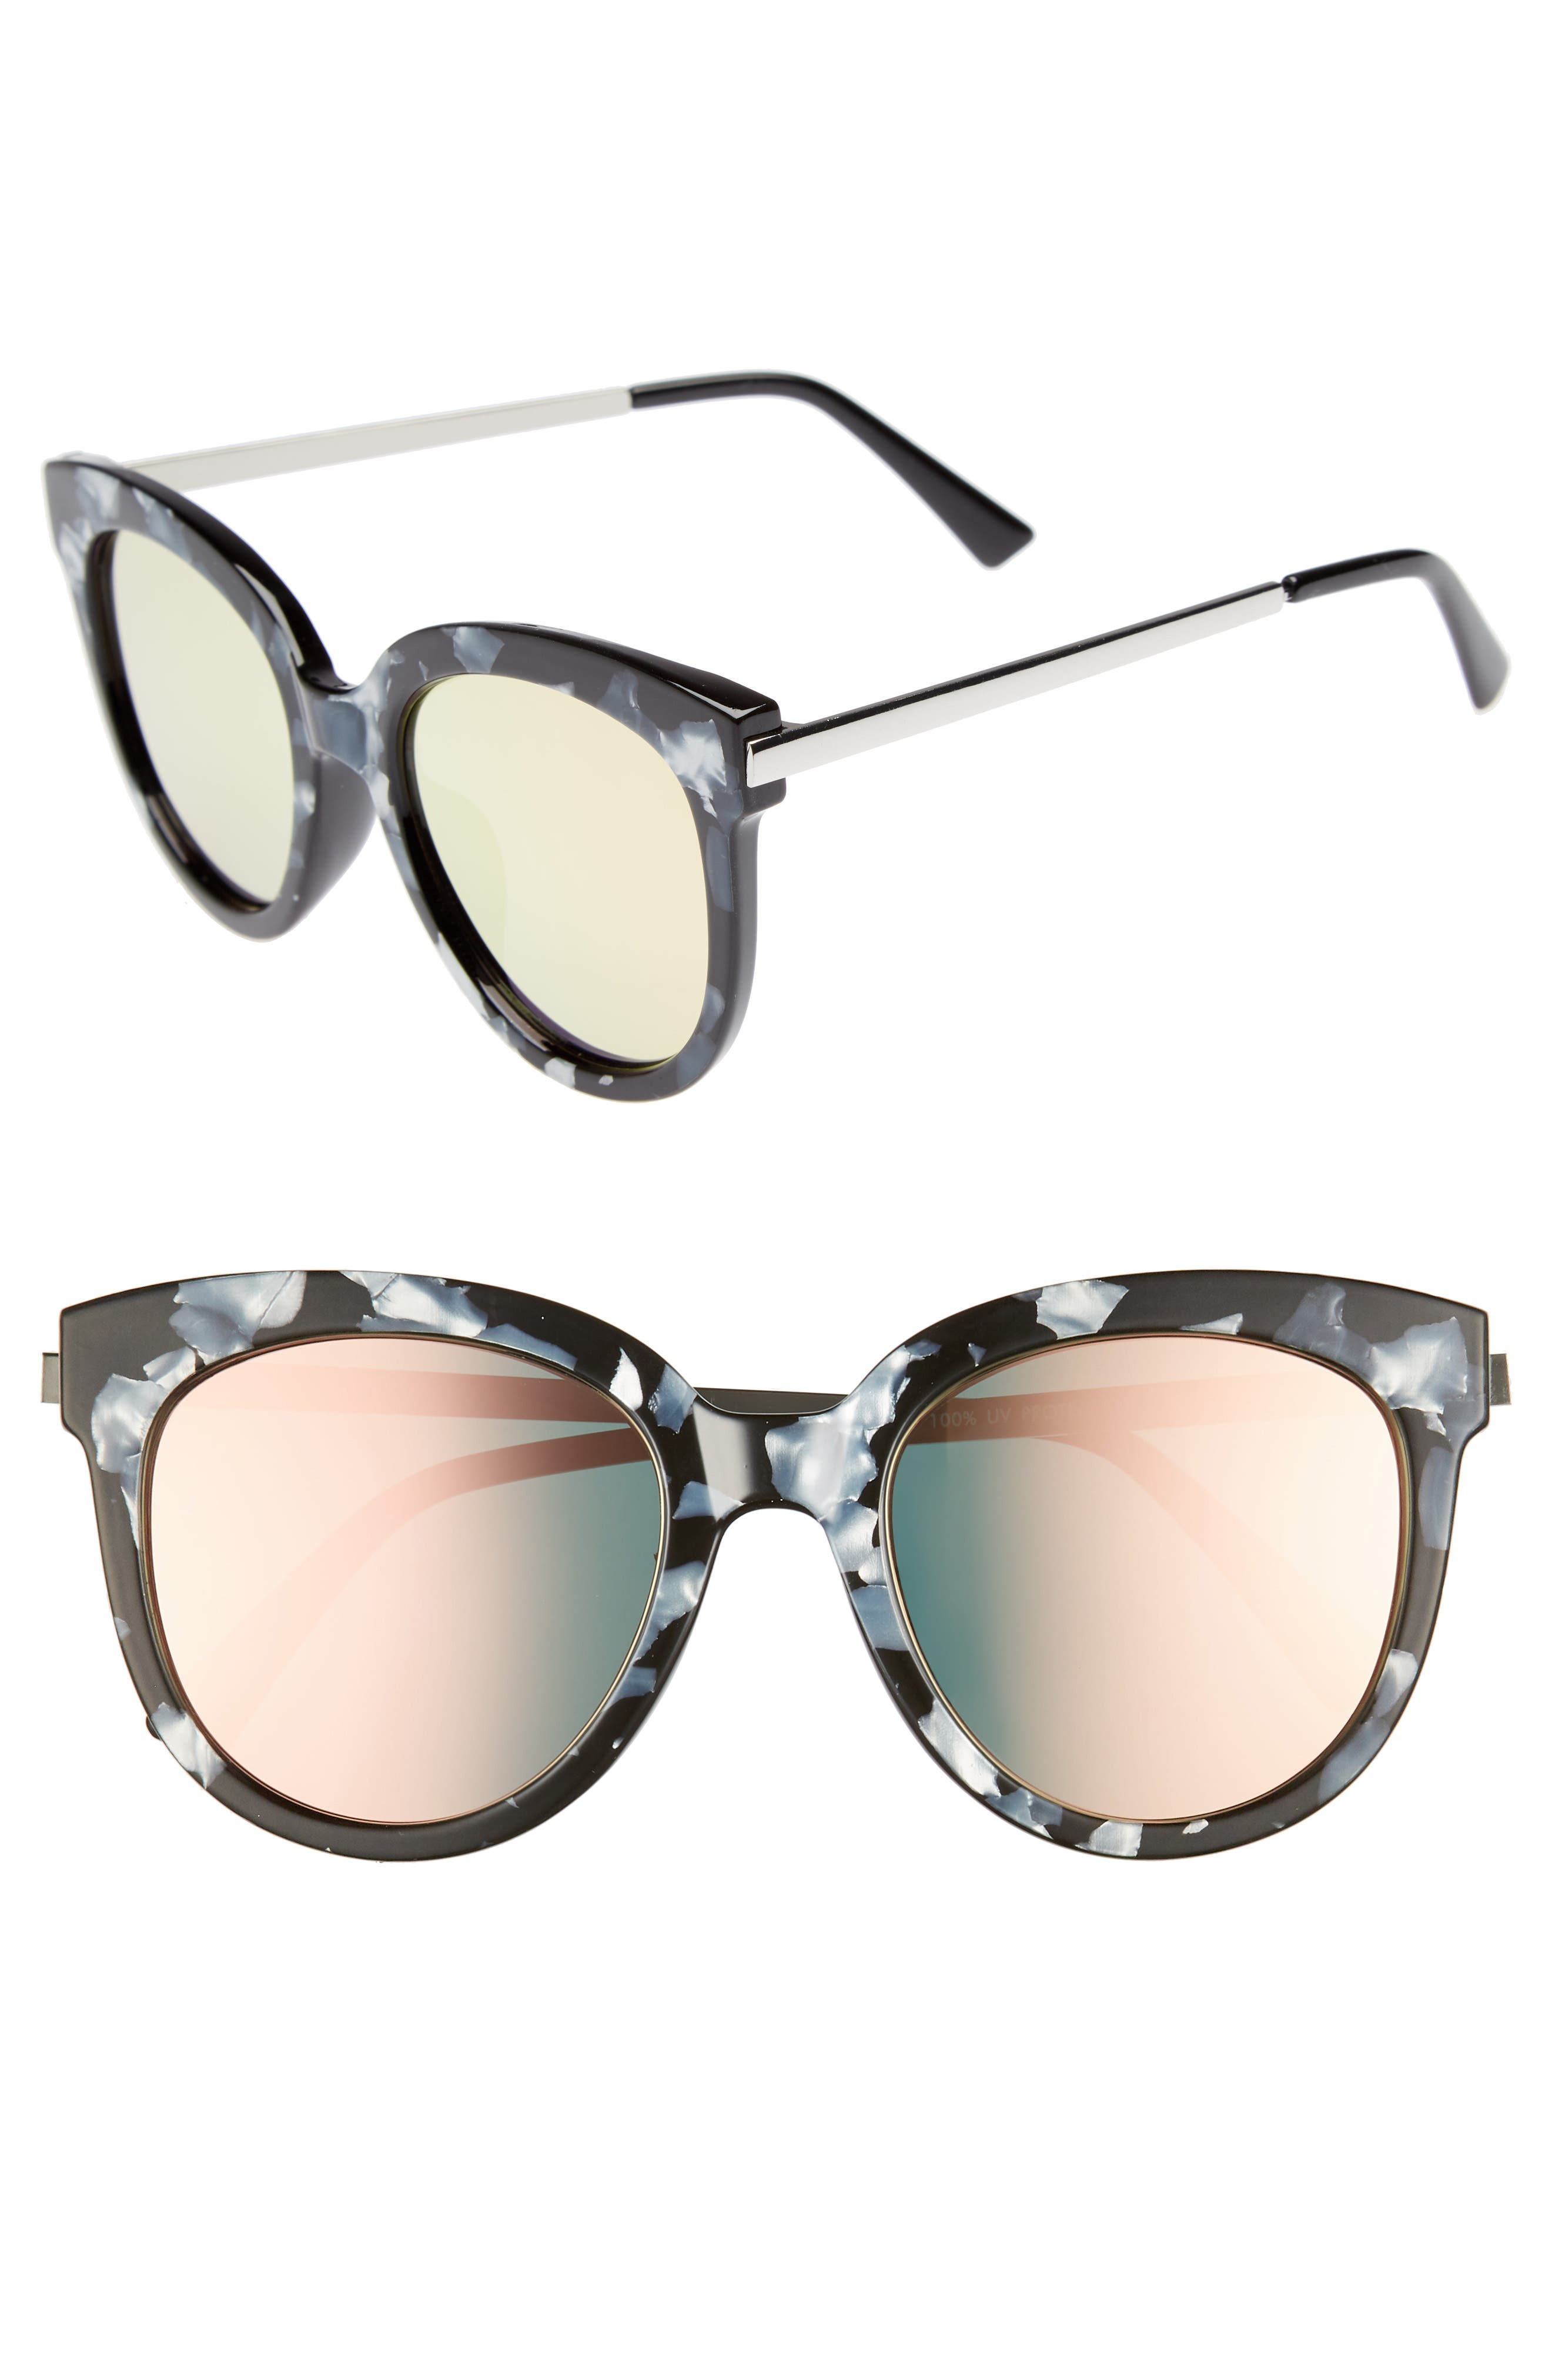 50mm Flat Cat Eye Sunglasses,                         Main,                         color, BLACK ACIDE PINK